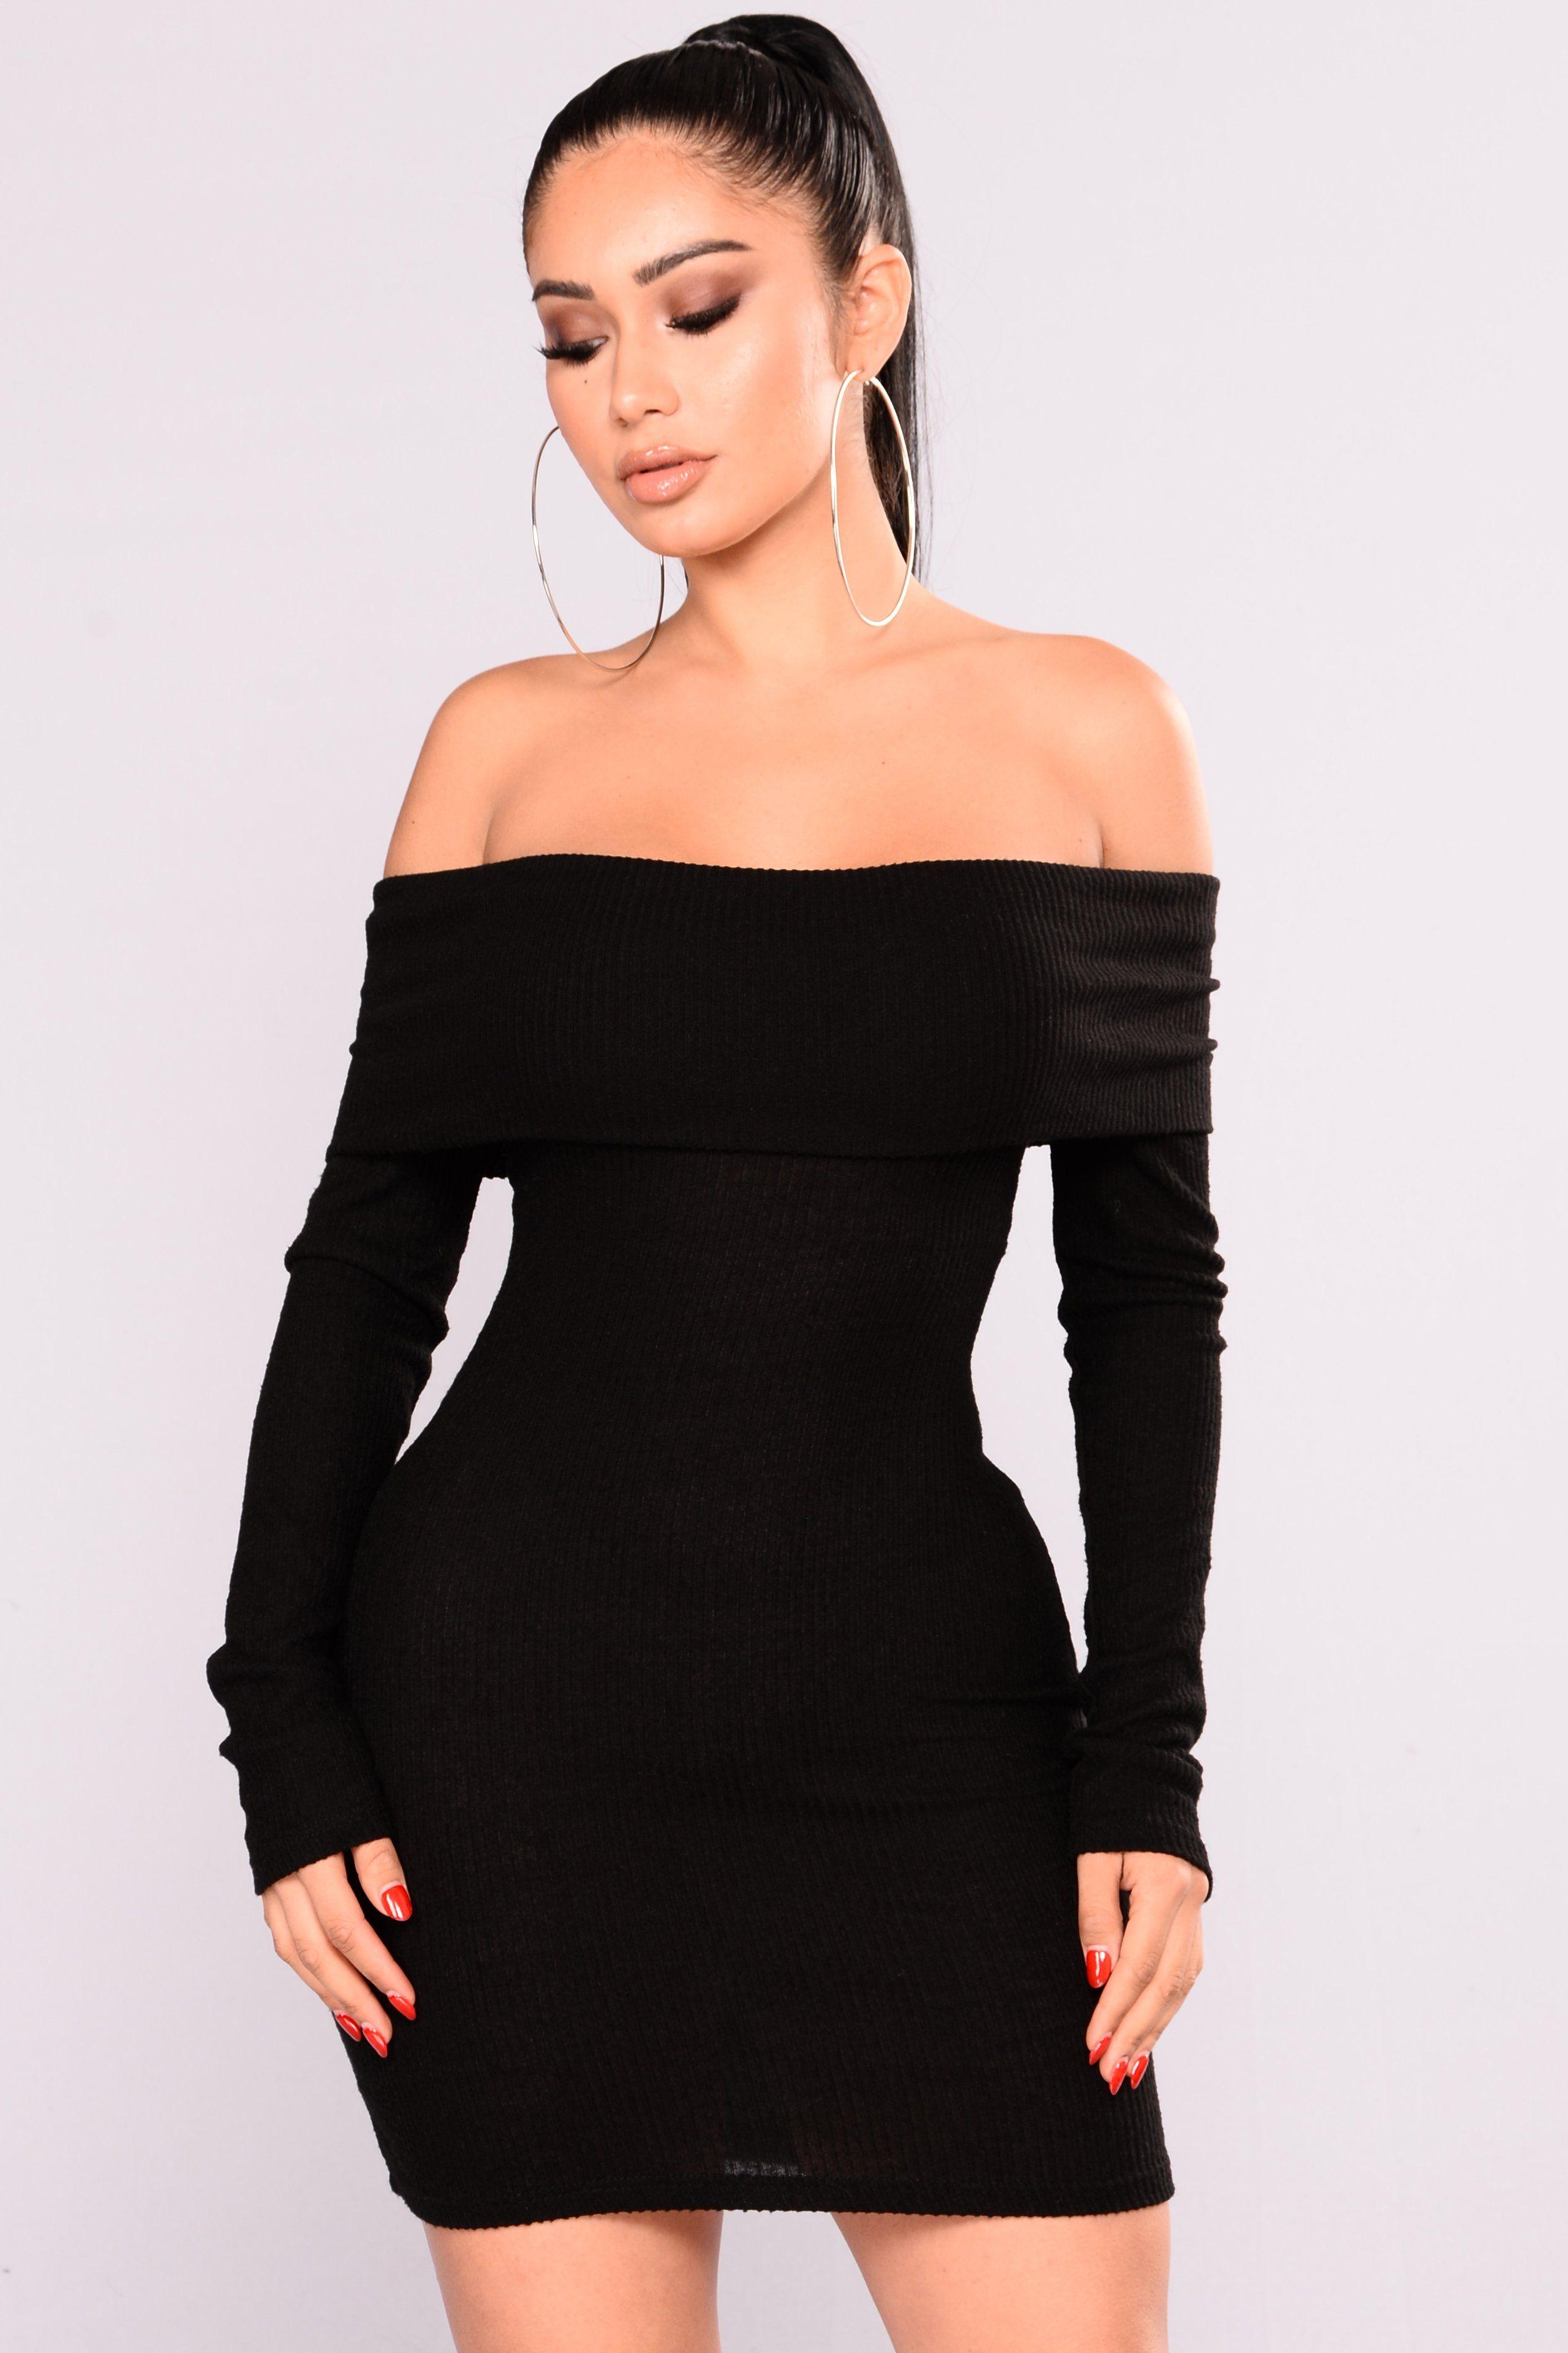 Fallon Off Shoulder Dress Black Black Long Sleeve Dress Fashion Nova Outfits Fashion Nova Dress [ 3766 x 2510 Pixel ]